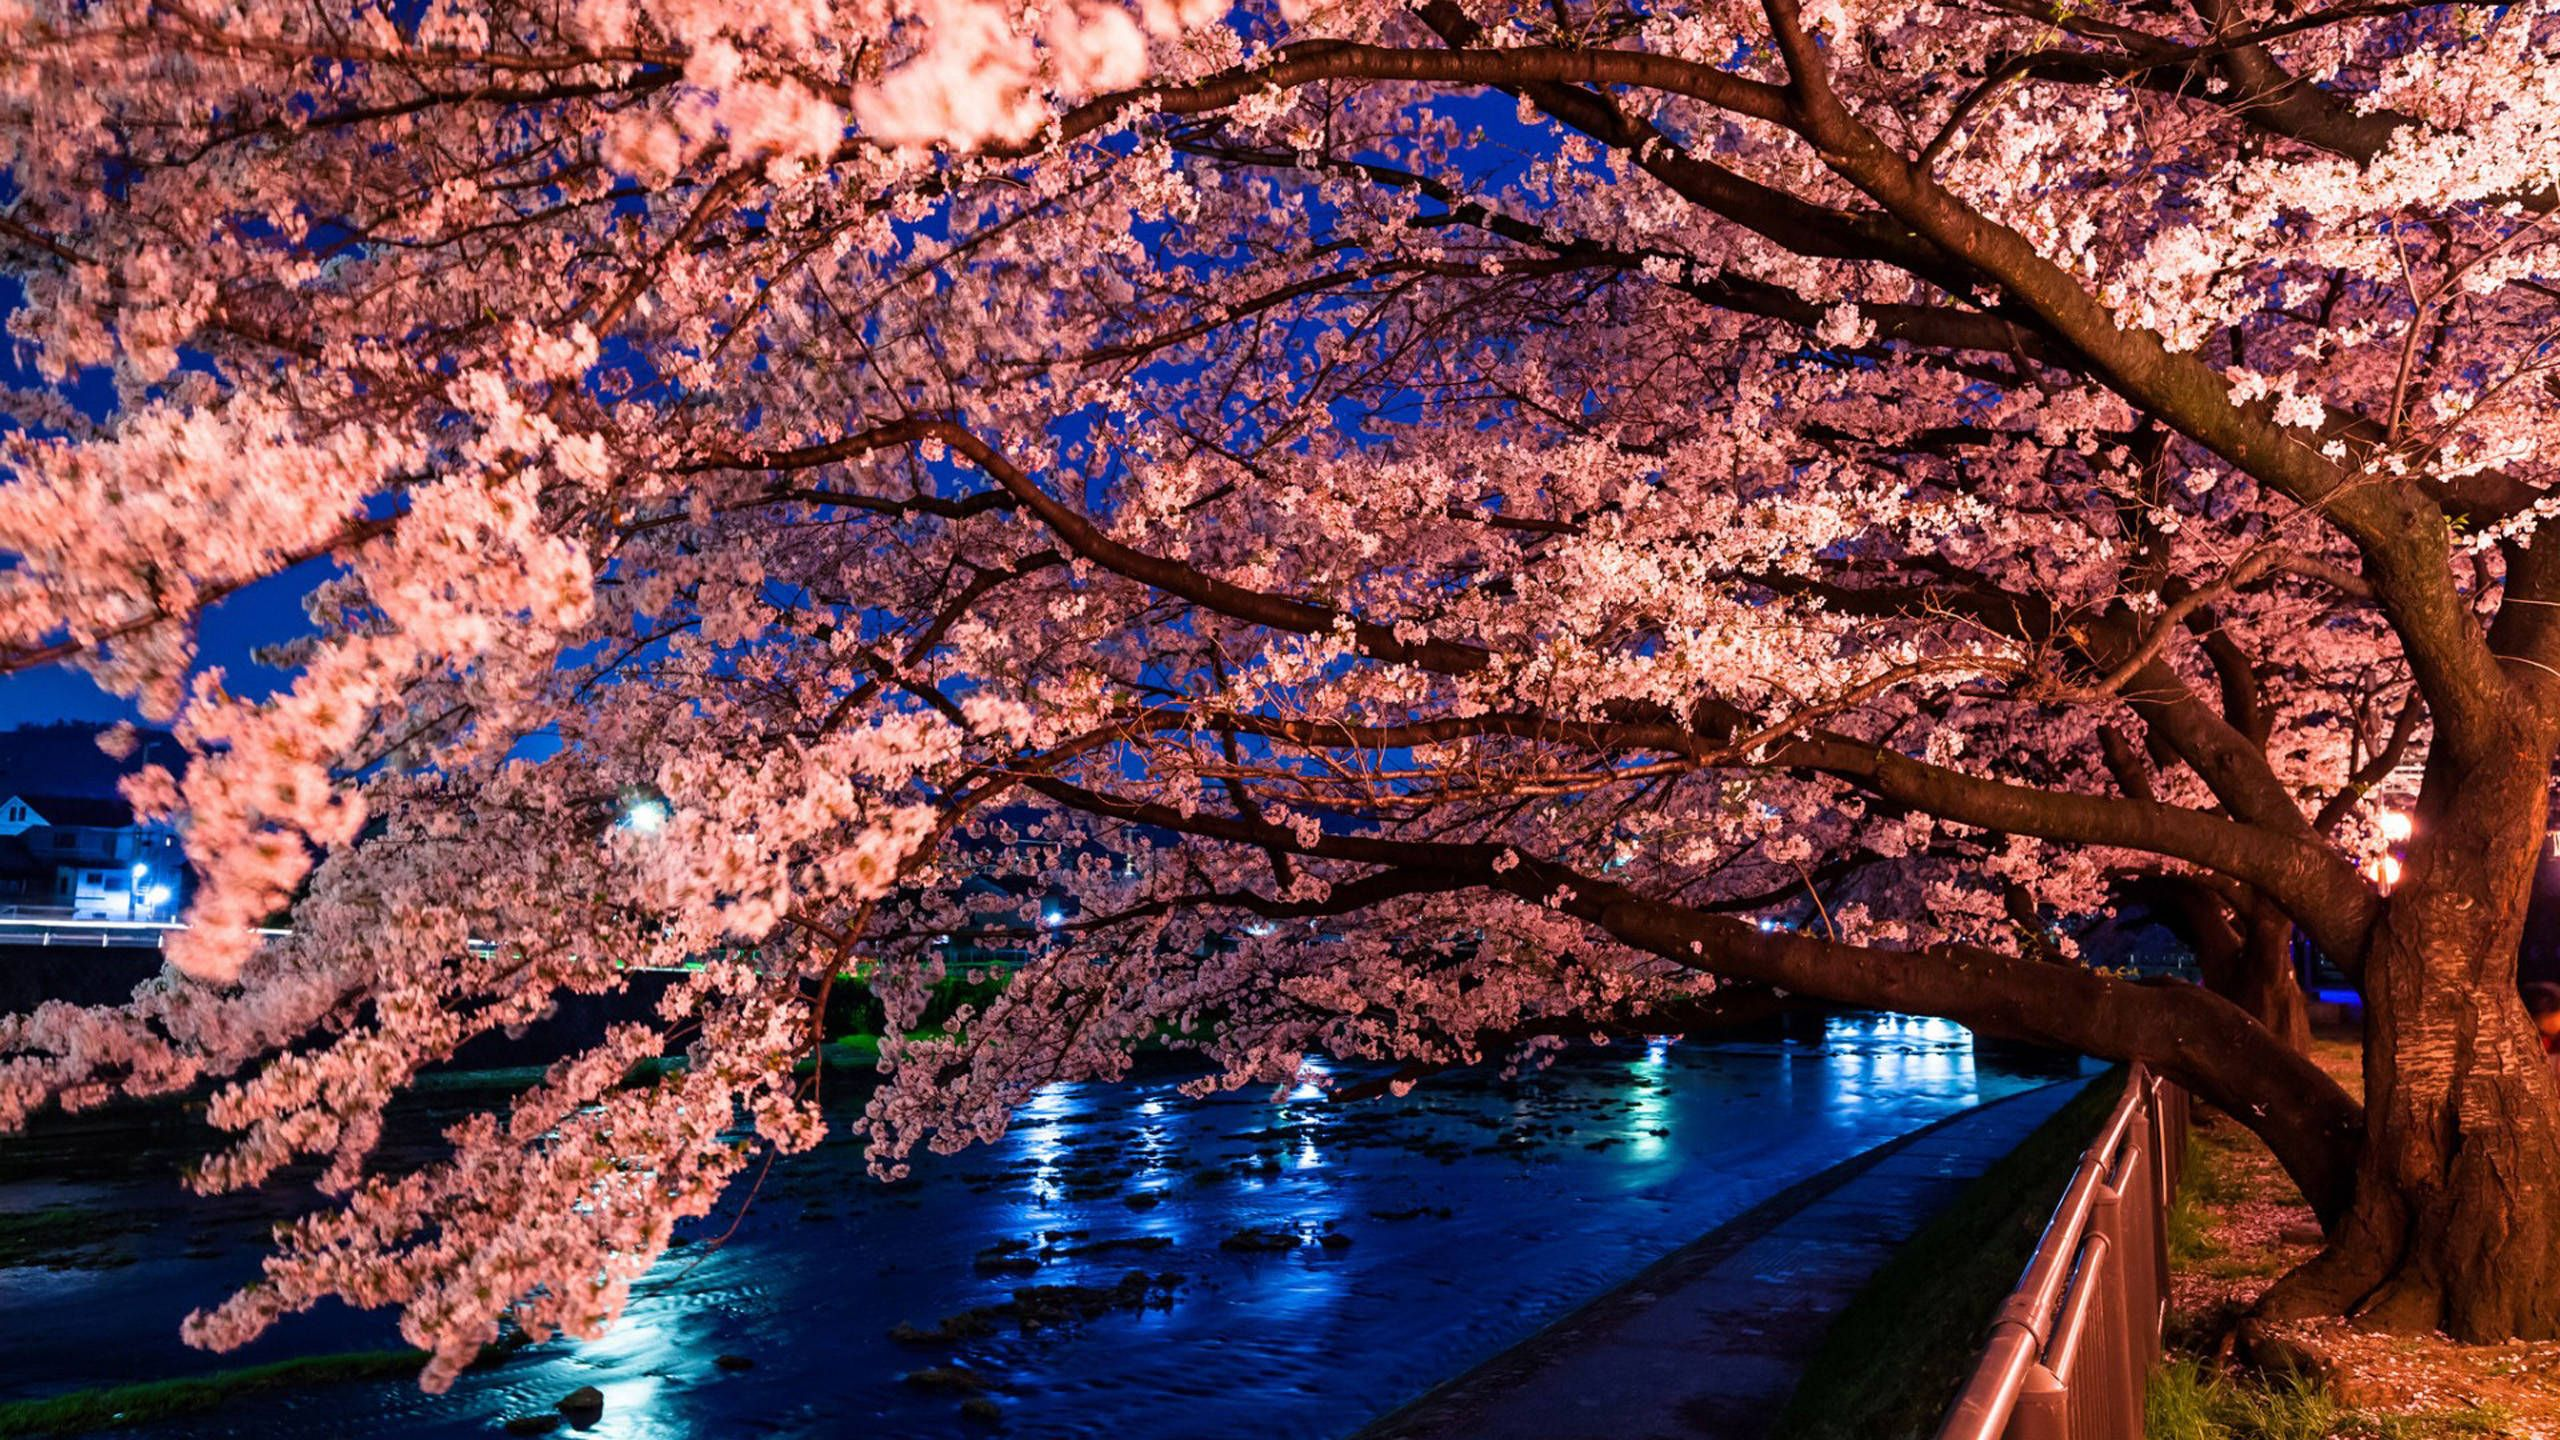 Anime Wallpaper Cherry Blossom Tree 0795 Sakura Tree Wallpaper Woodenboxlwp High Quality Hd 09 July 2018 Anime Cherry Blossom Wallpaper Japanese Cherry Bloss